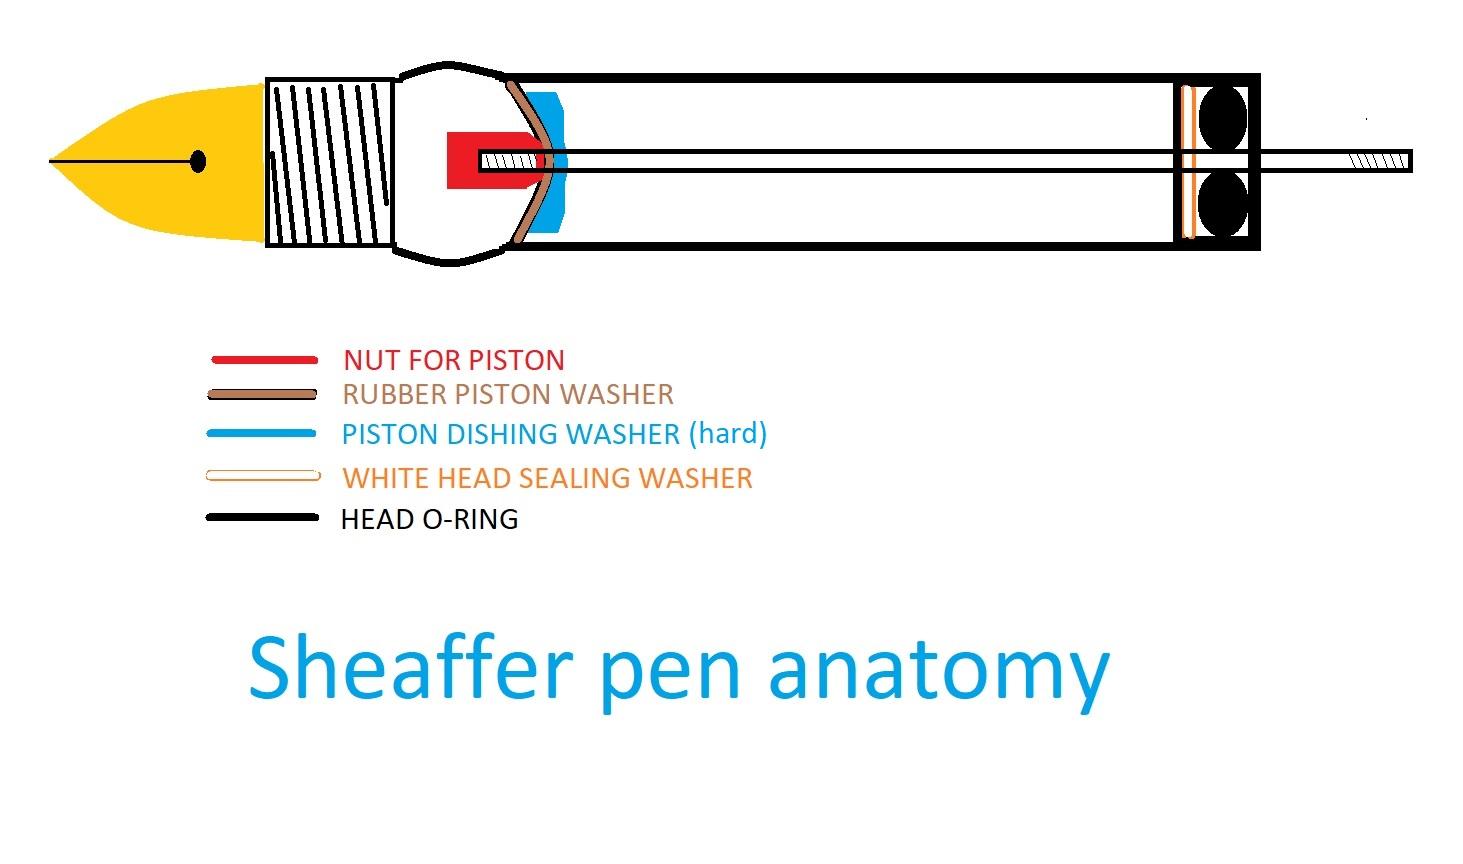 fpn_1567089433__sheaffer_pen_anatomy_vac